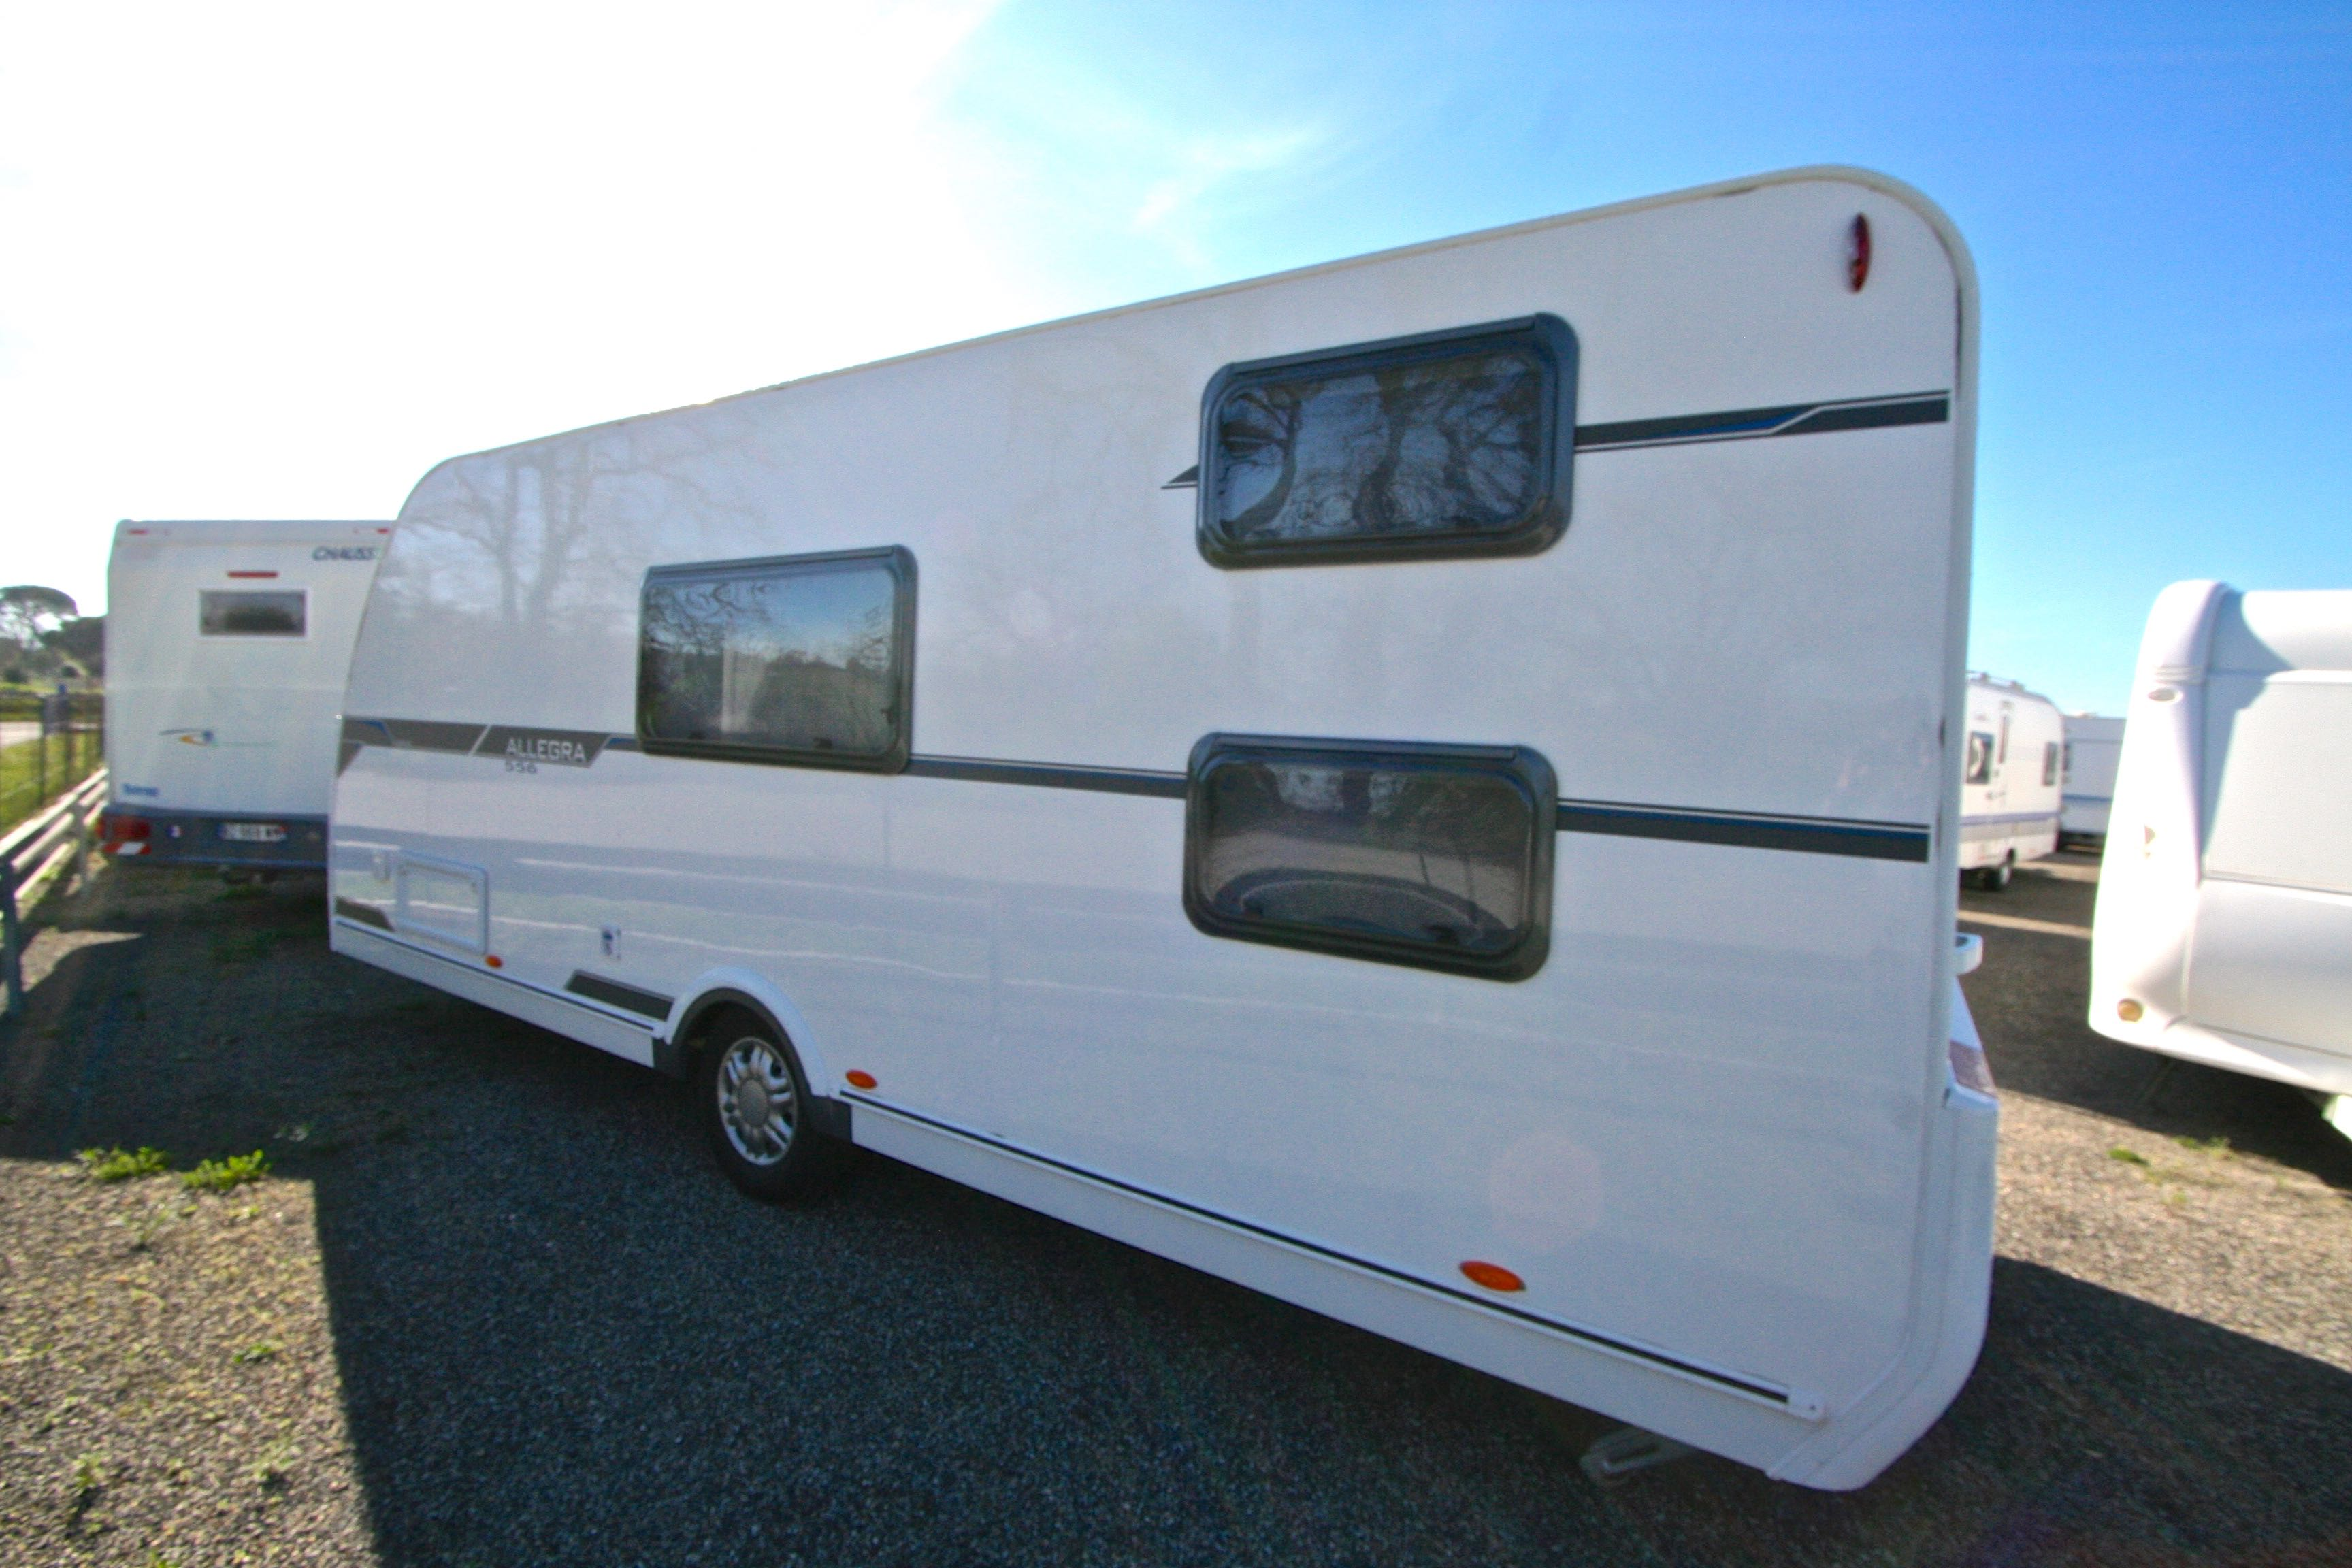 caravelair allegra 556 occasion caravane en vente roques. Black Bedroom Furniture Sets. Home Design Ideas